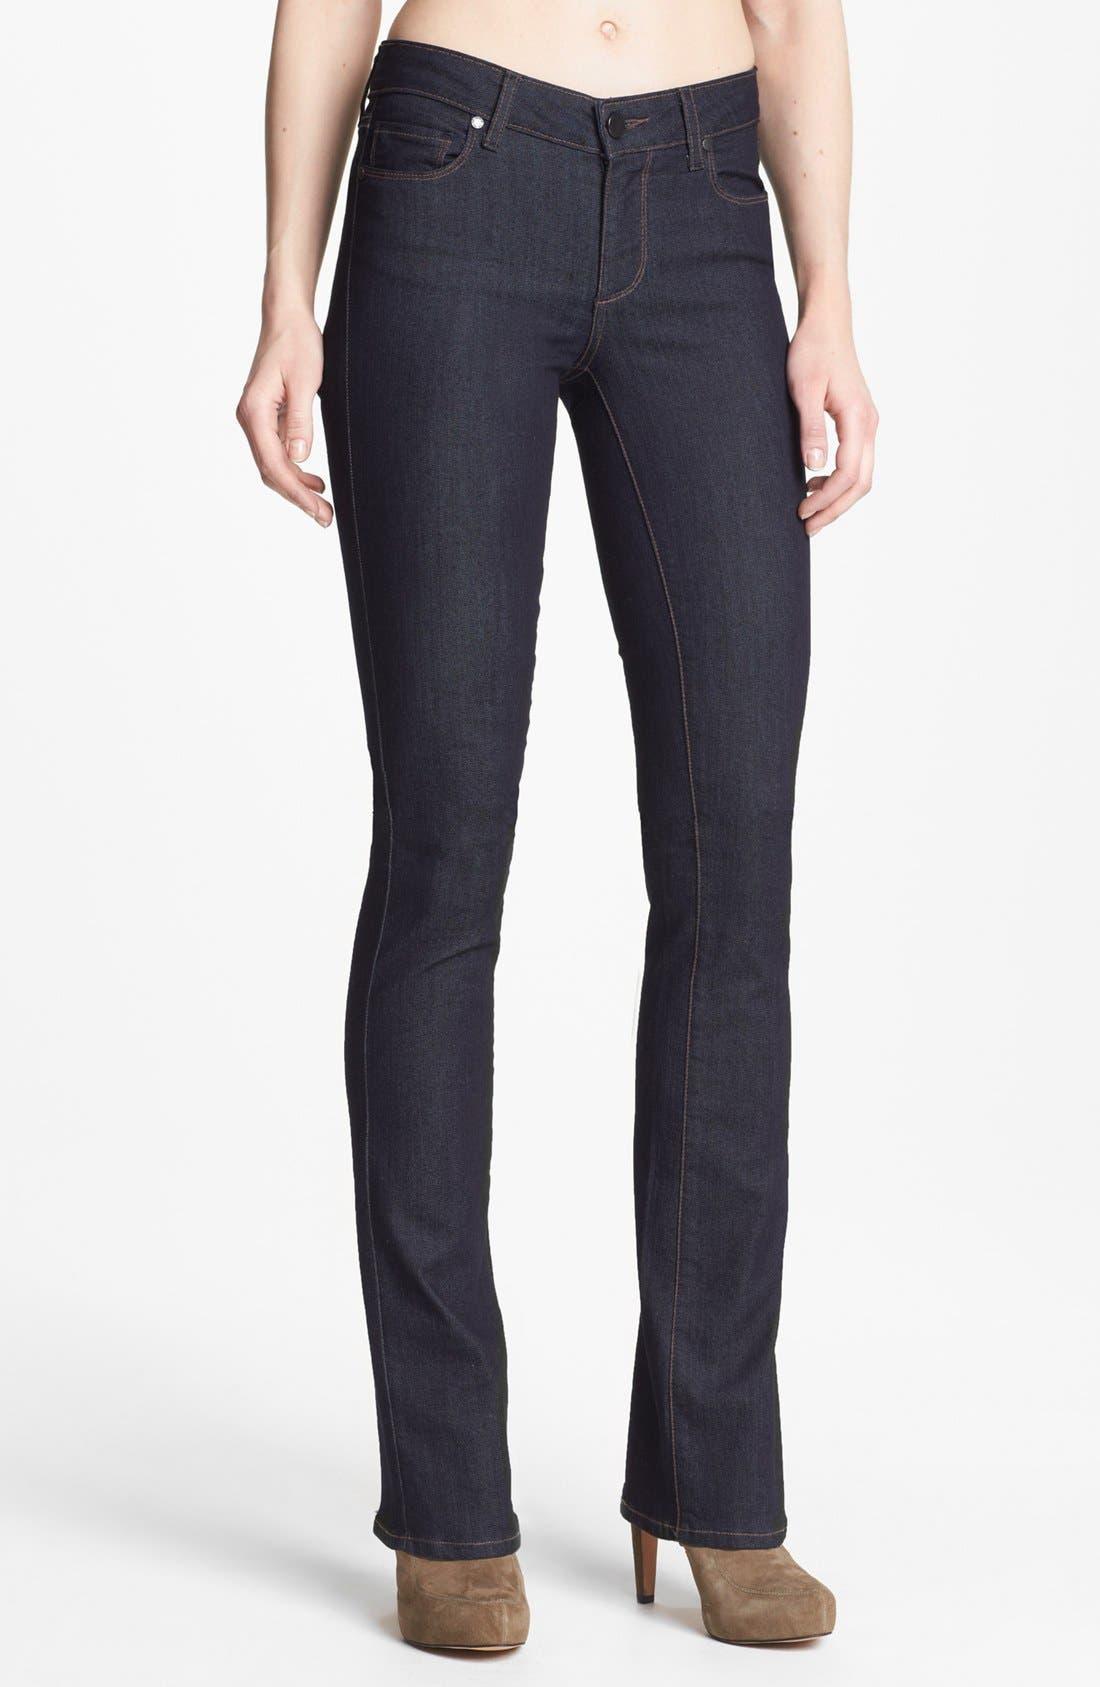 Alternate Image 1 Selected - Paige Denim 'Manhattan' Baby Bootcut Jeans (Elyse)